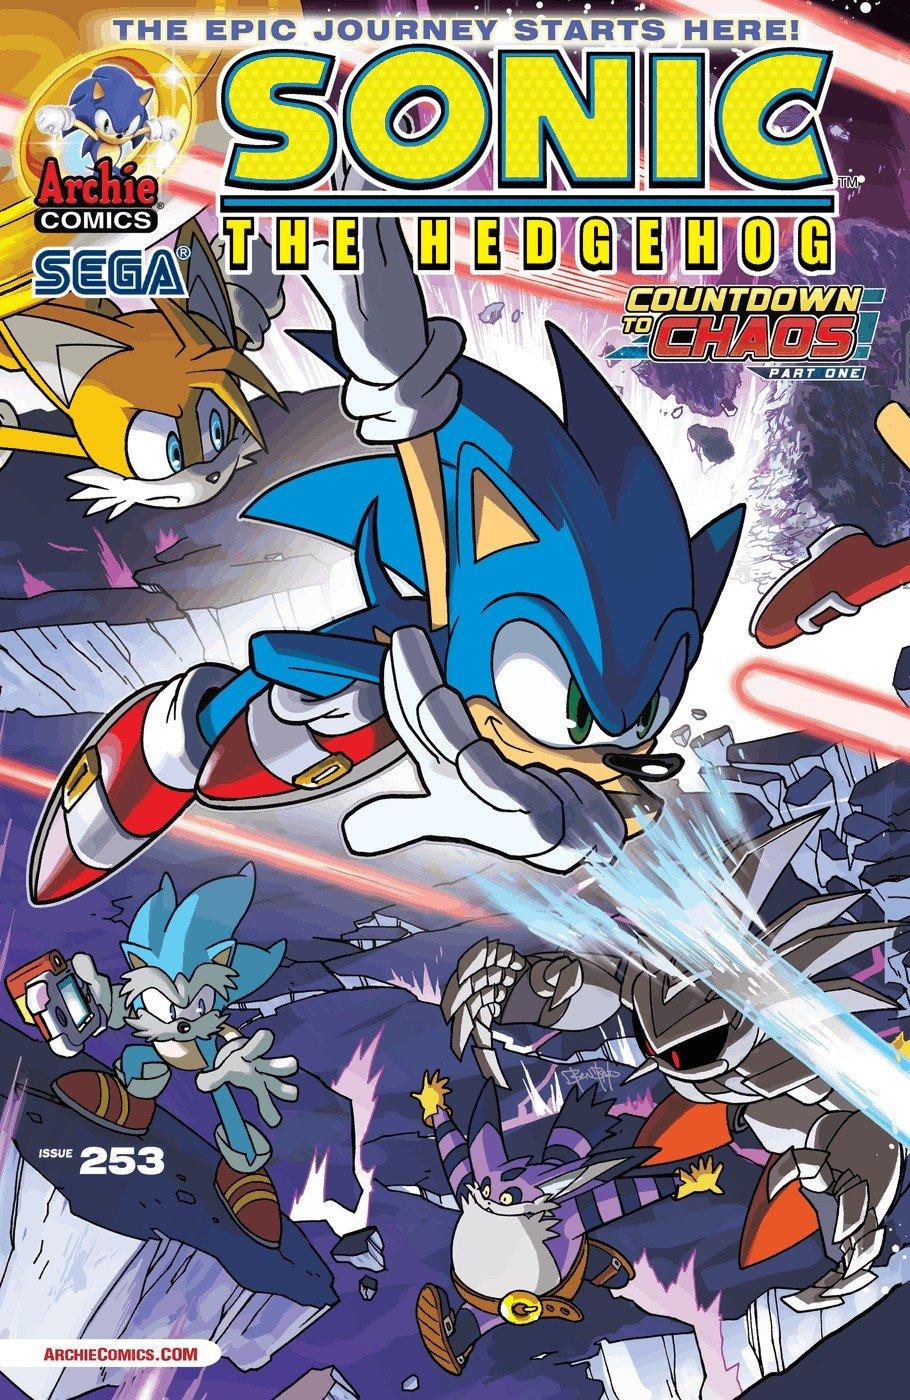 Sonic the Hedgehog 253 (November 2013)